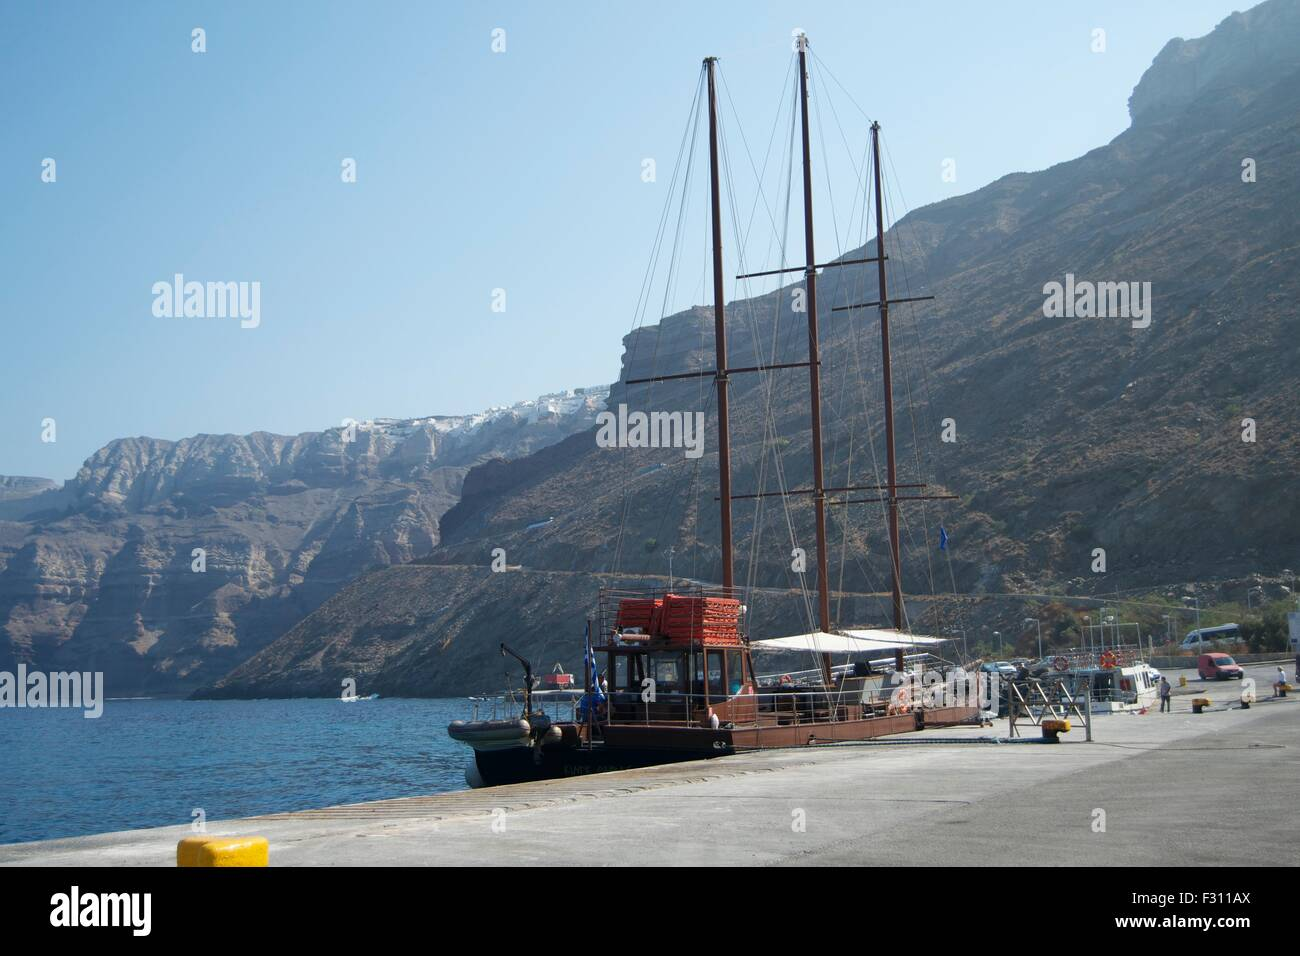 boat ship anchored harbored coast Greece Mykonos - Stock Image